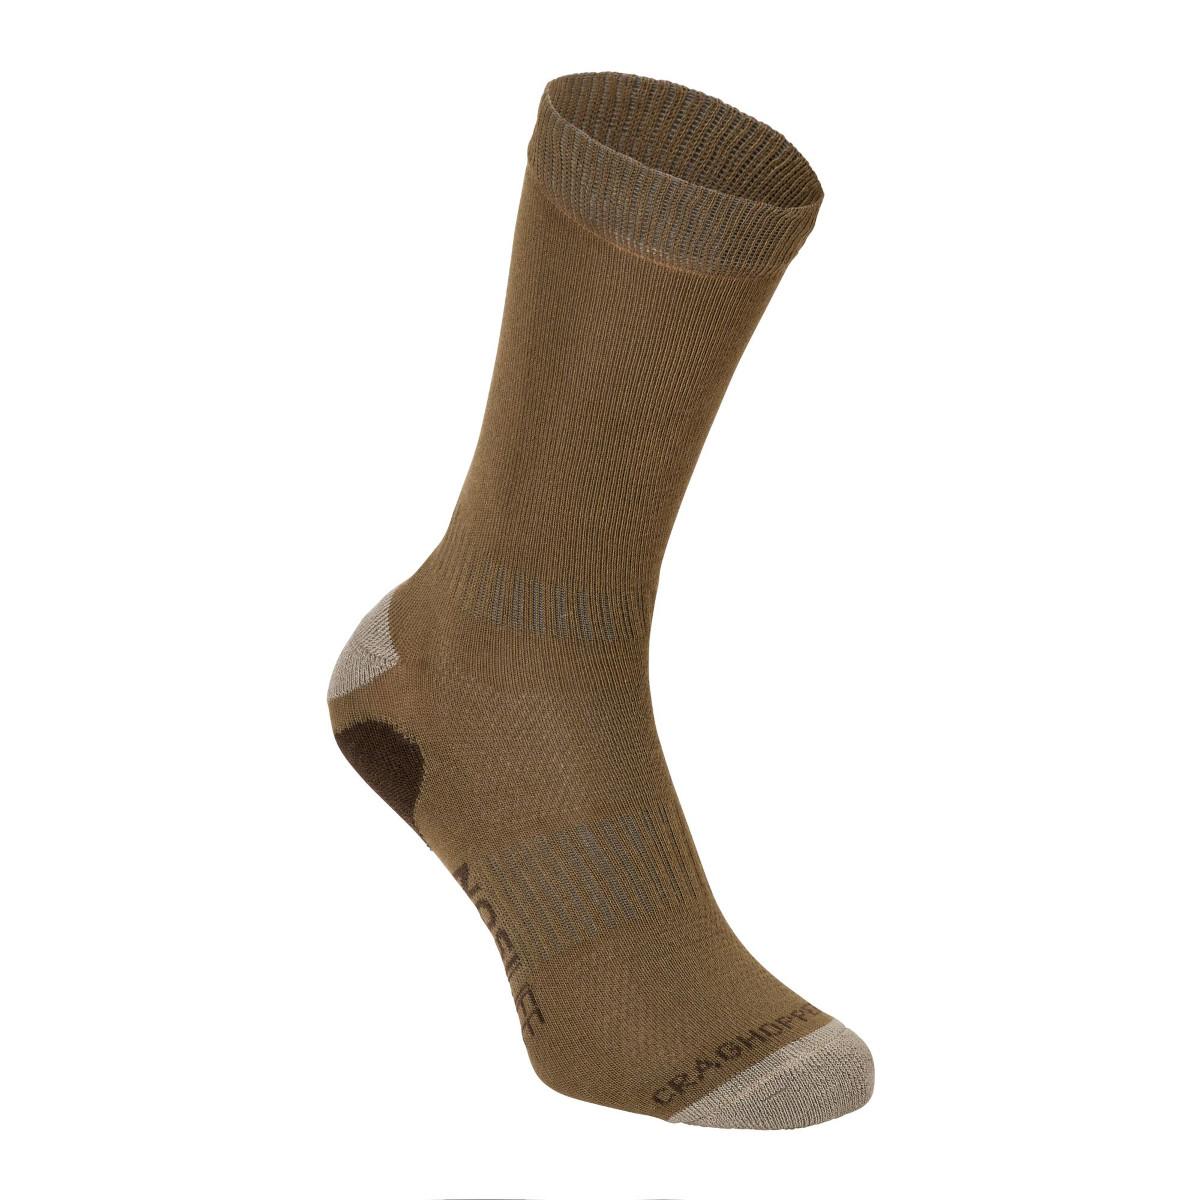 Craghoppers NosiLife Adventure Sock - Kangaroo